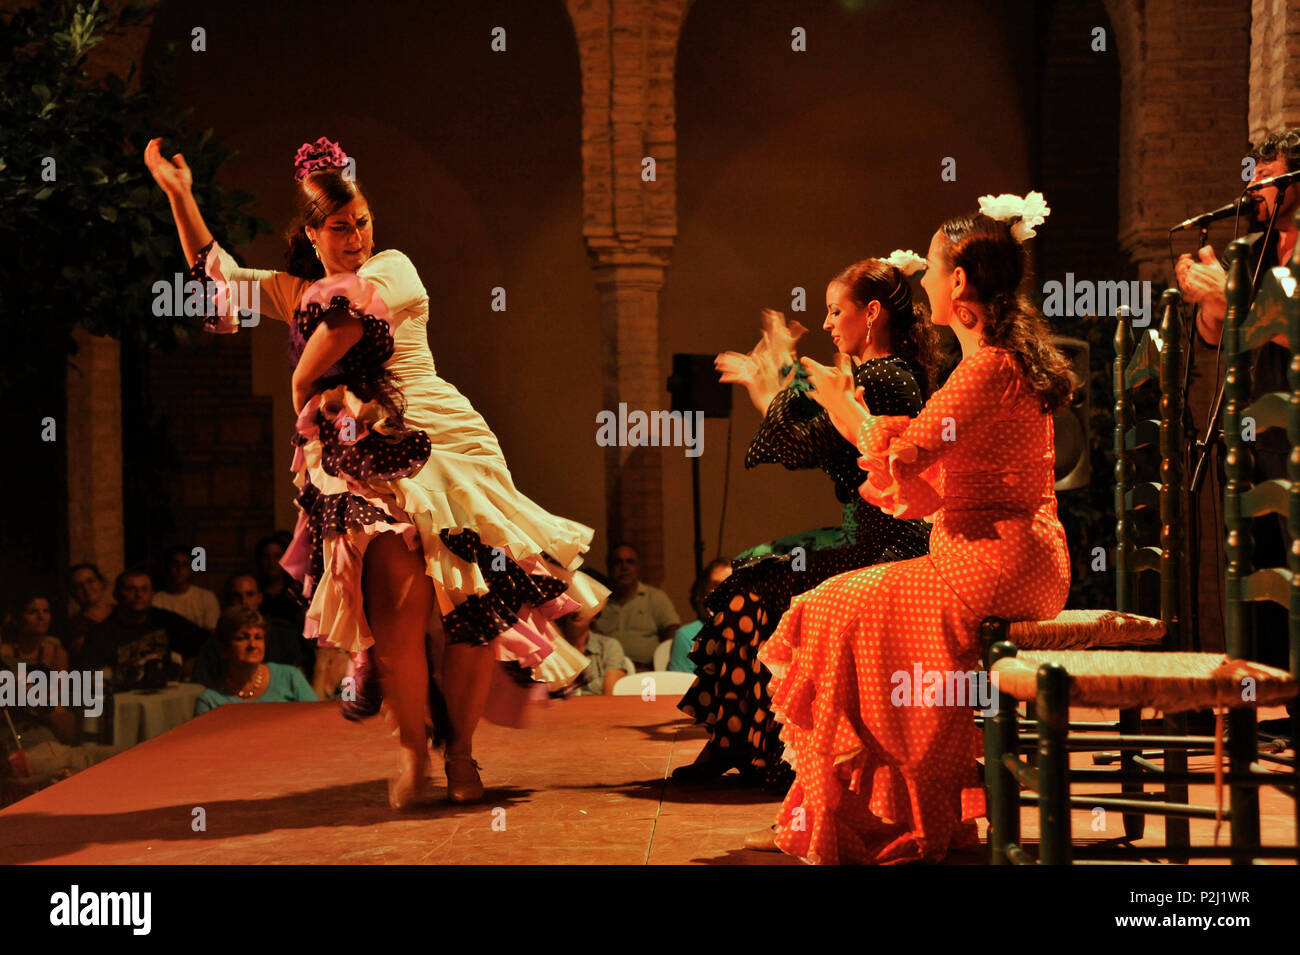 Flamenco show in the Palacio Episcopal de Cordoba next to the Mezquita in the evening, Cordoba, Andalusia, Spain - Stock Image